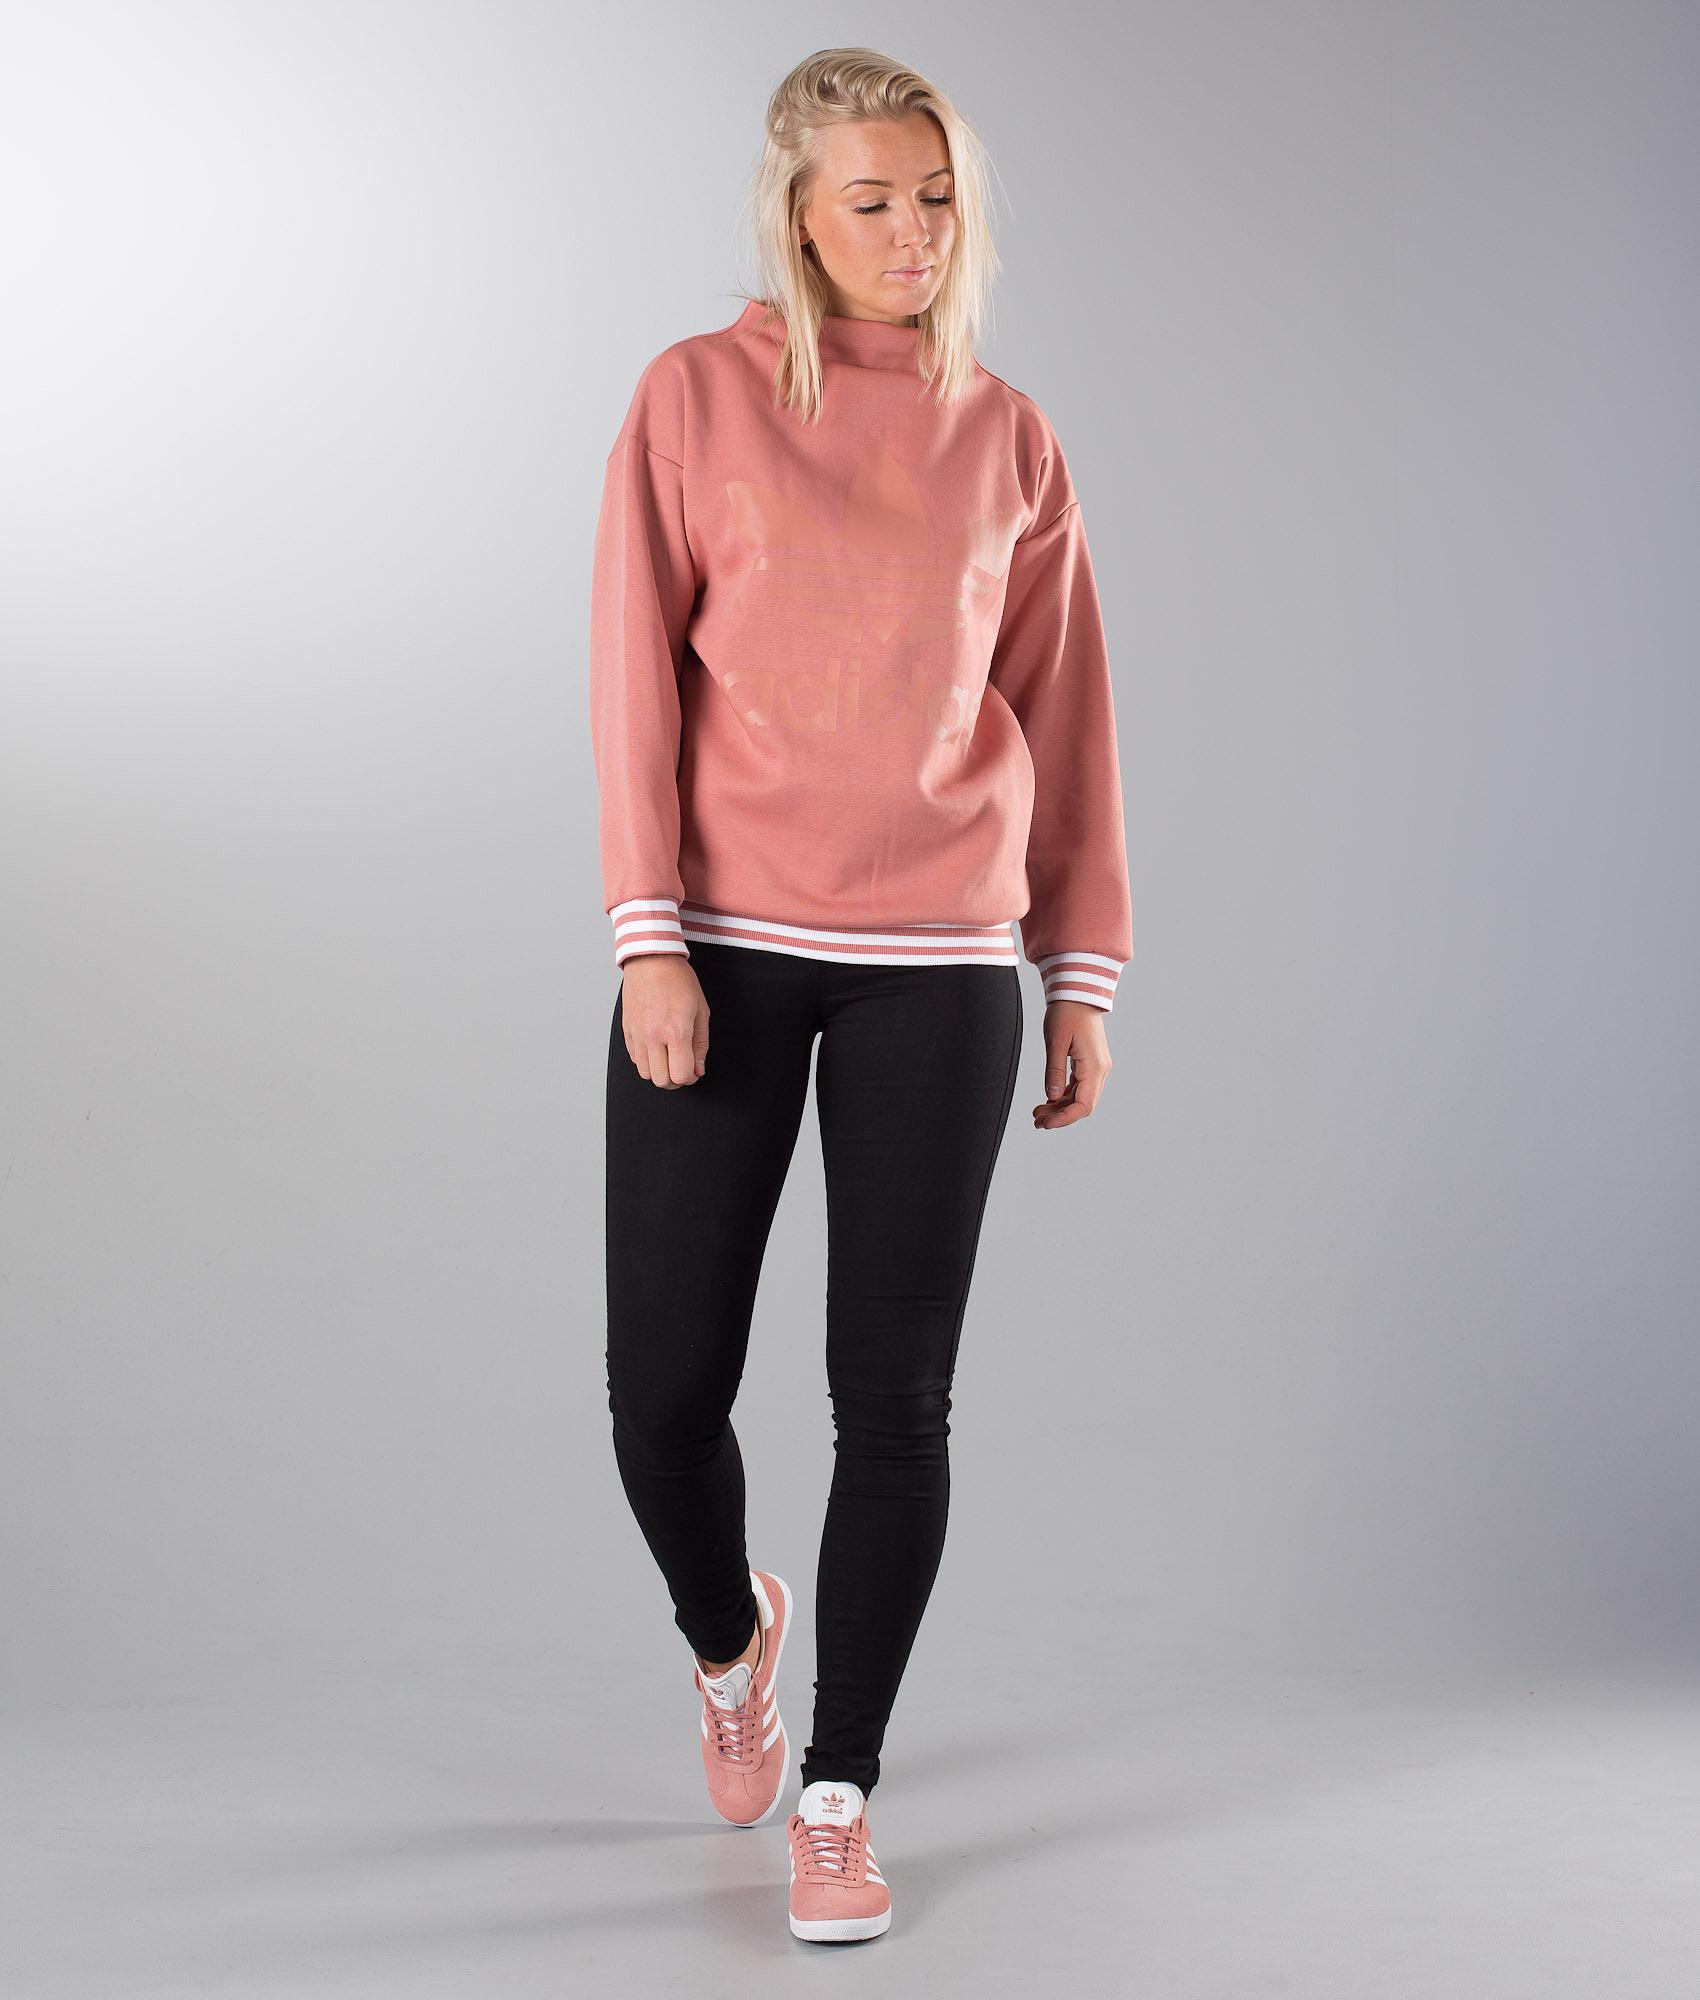 bb51dae051c23f Adidas Originals Sweatshirt Sweater Ash Pink - Ridestore.com